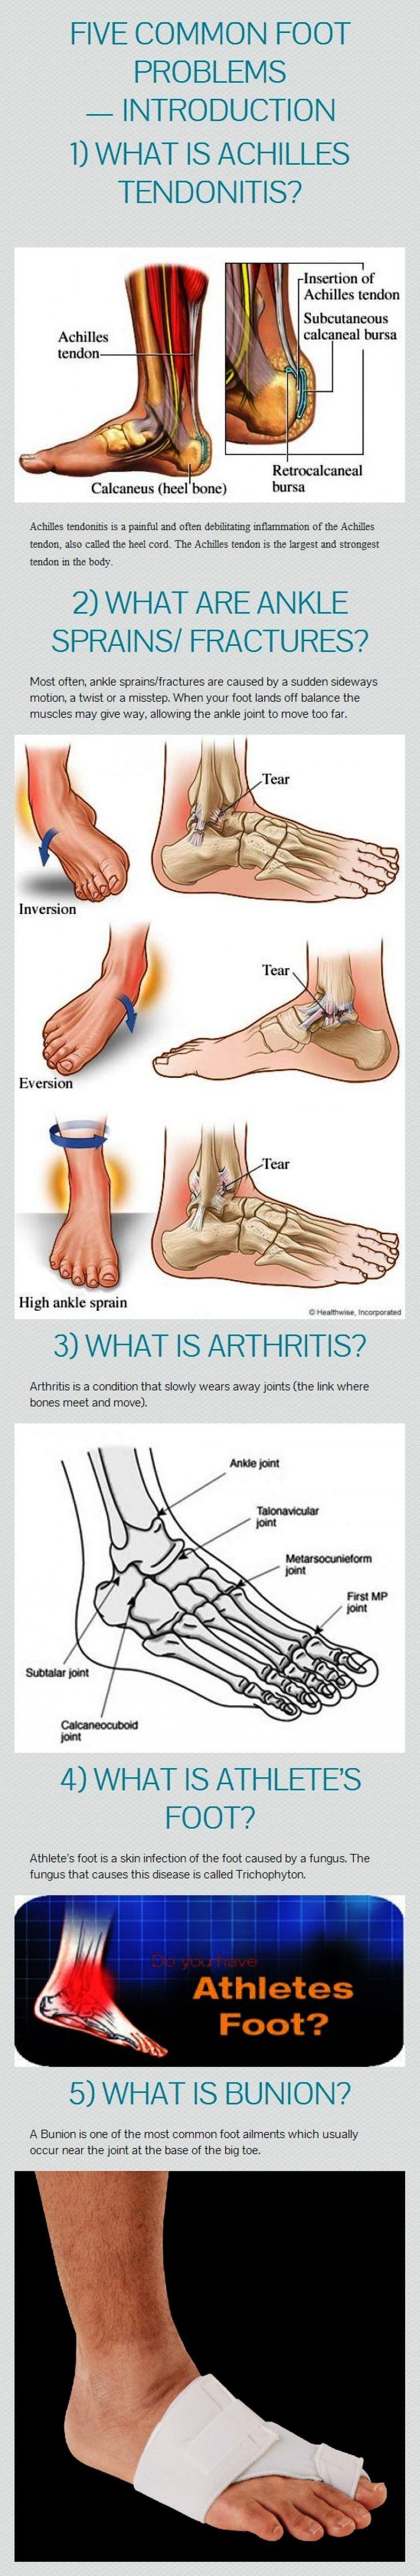 #Infographic - Five common foot problems: 1. Achilles tendonitis; 2. Ankle sprains/fractures; 3. Arthritis; 4. Athlete's foot; 5. Bunion. #orthotics #FootOrthotics #CustomFootOrthotics #arthritisinfographic